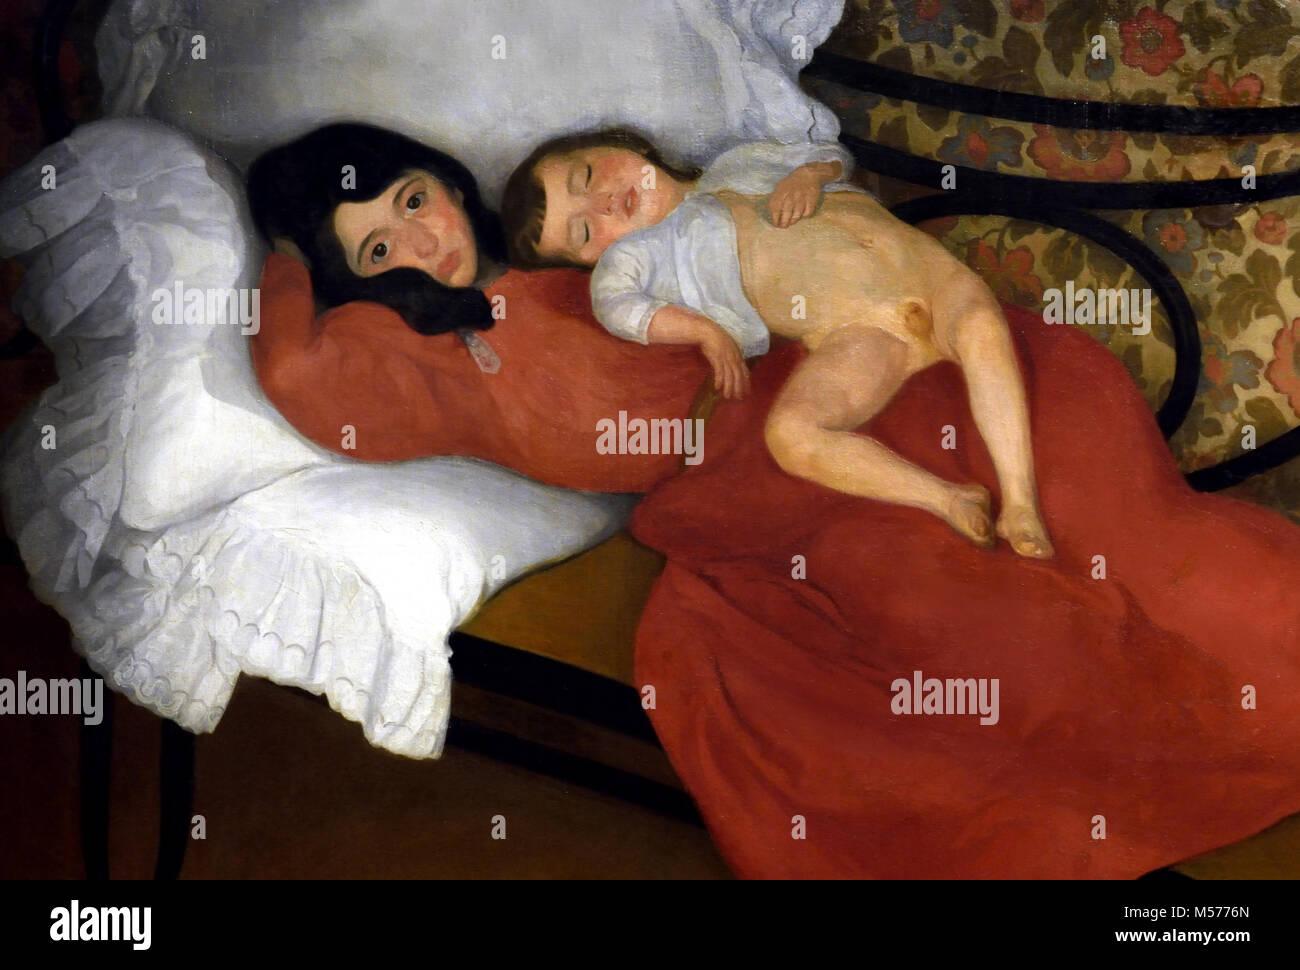 Motherhood 1895 Larroque, Ángel (Bilbao, Bizkaia, 1874 -  Bilbao, Bizkaia, 1961) 20 th, century, Spain, Spanish, - Stock Image